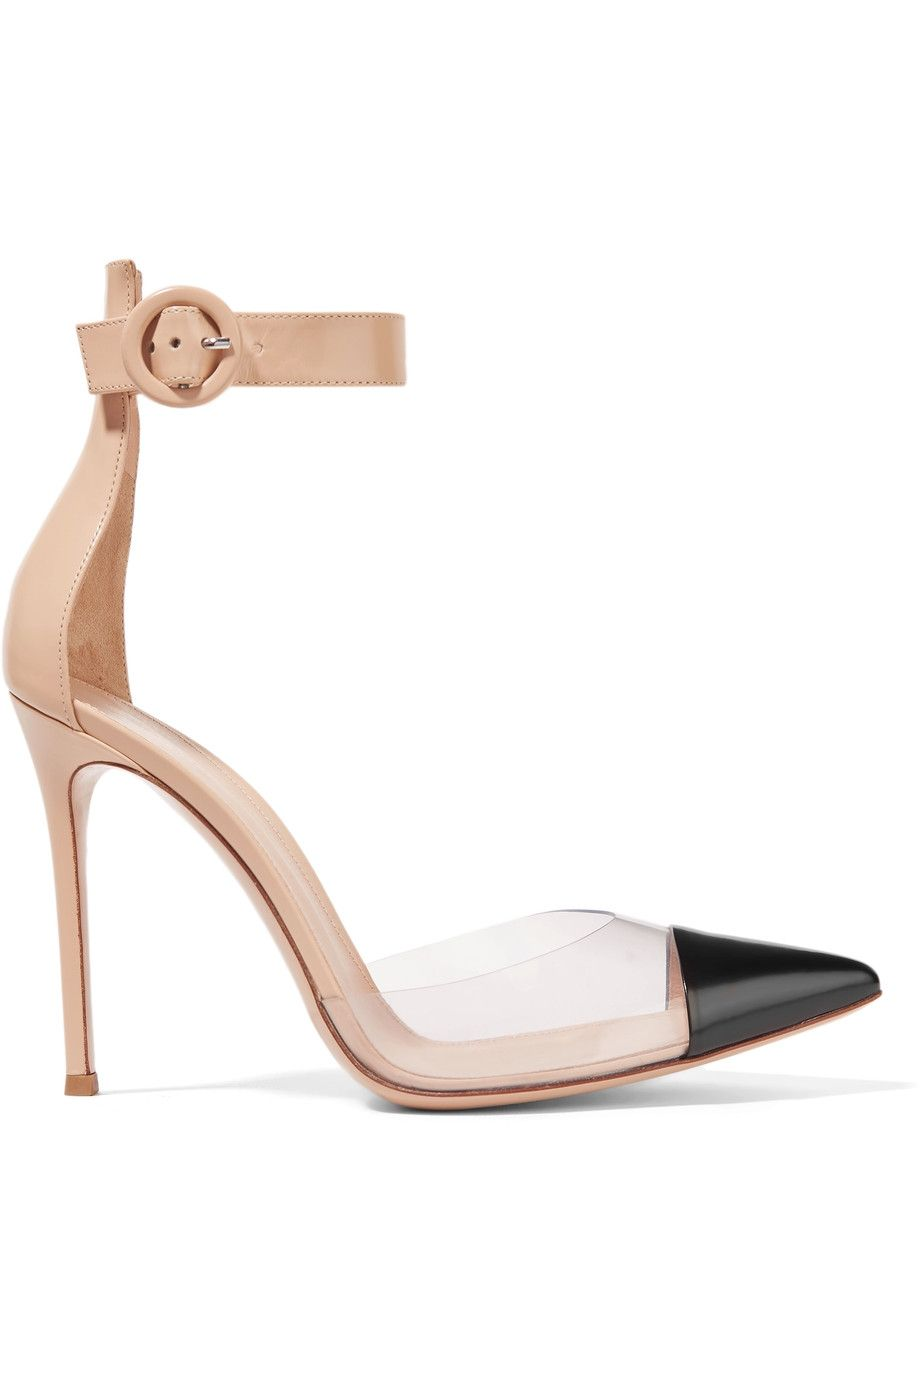 cb5ef6ae9 GIANVITO ROSSI Color-Block Leather And Pvc Pumps. #gianvitorossi #shoes  #pumps